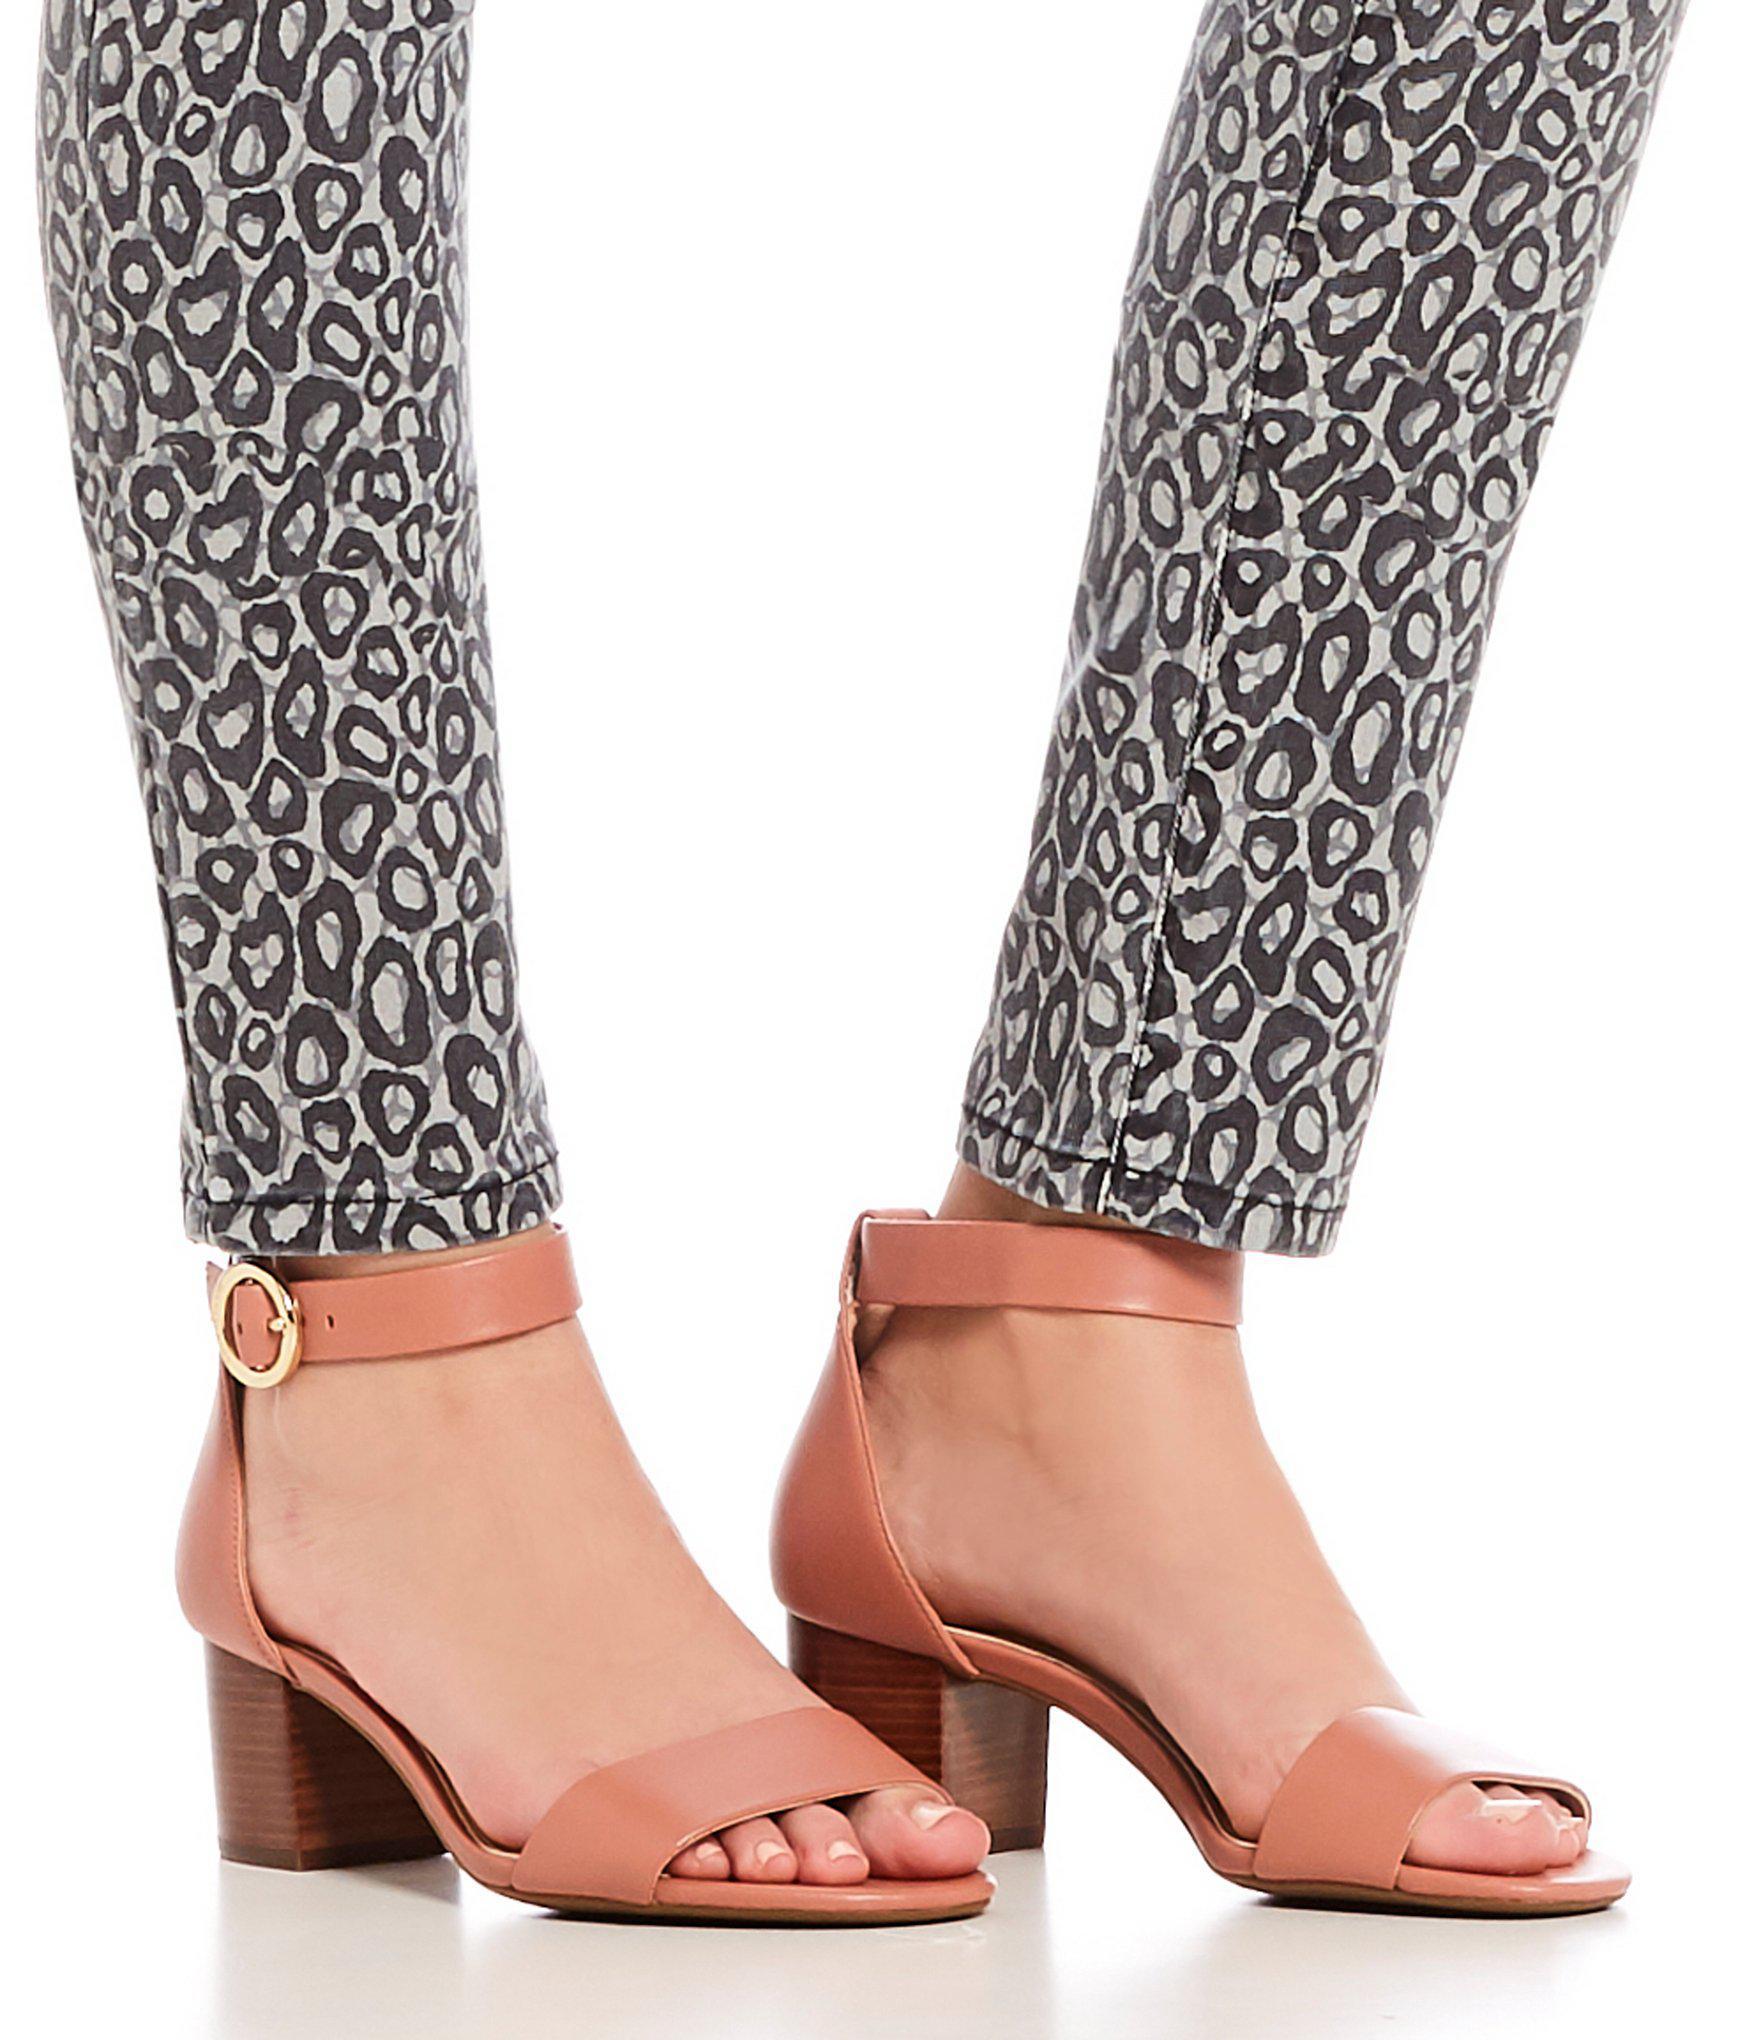 388b8713b77 MICHAEL Michael Kors Lena Flex Block Heel Sandals - Lyst